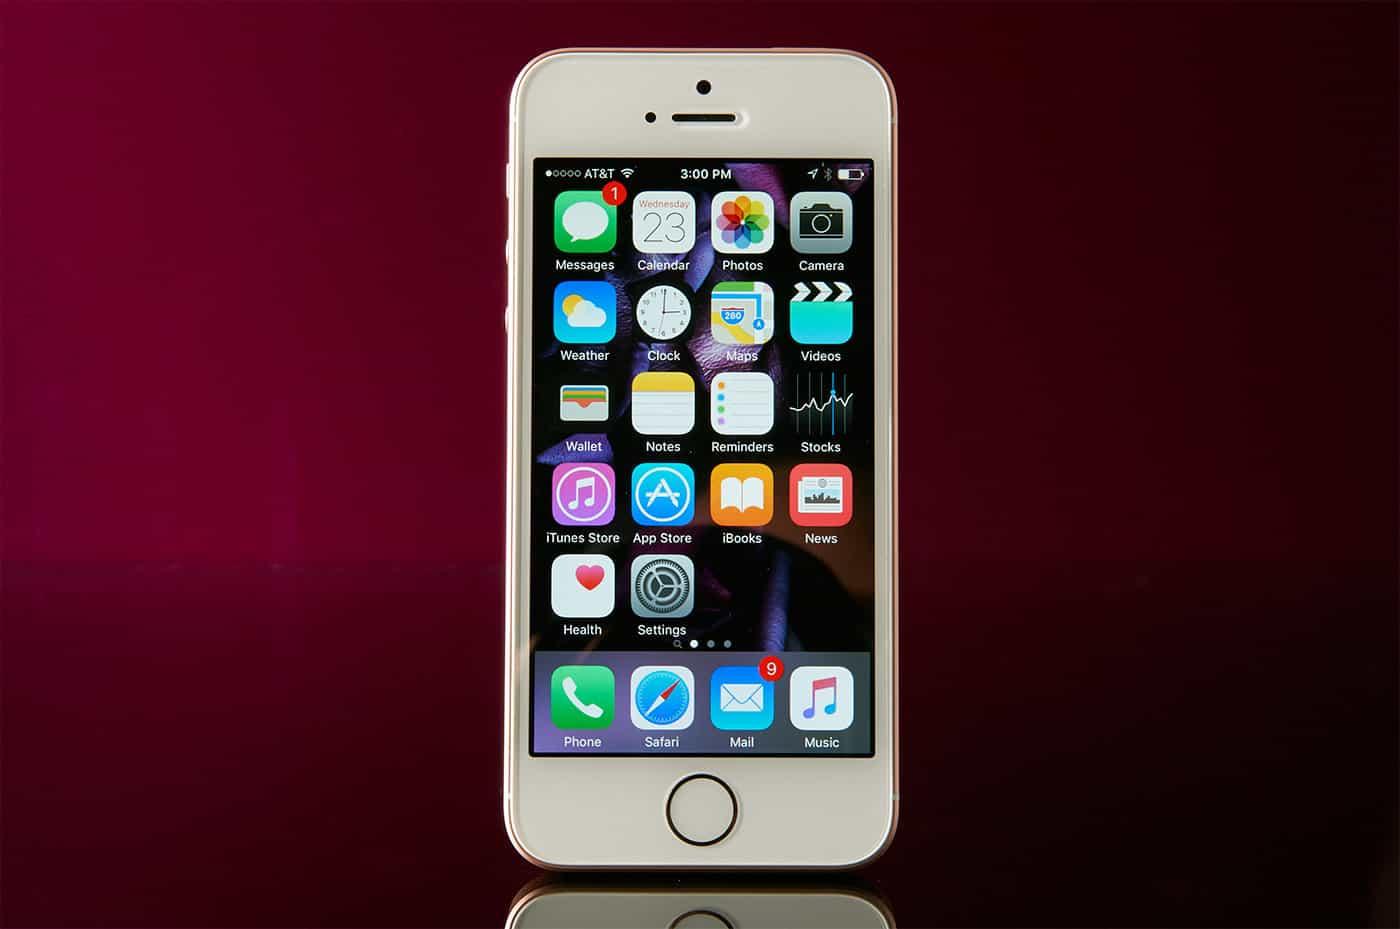 iPhone SE first gen